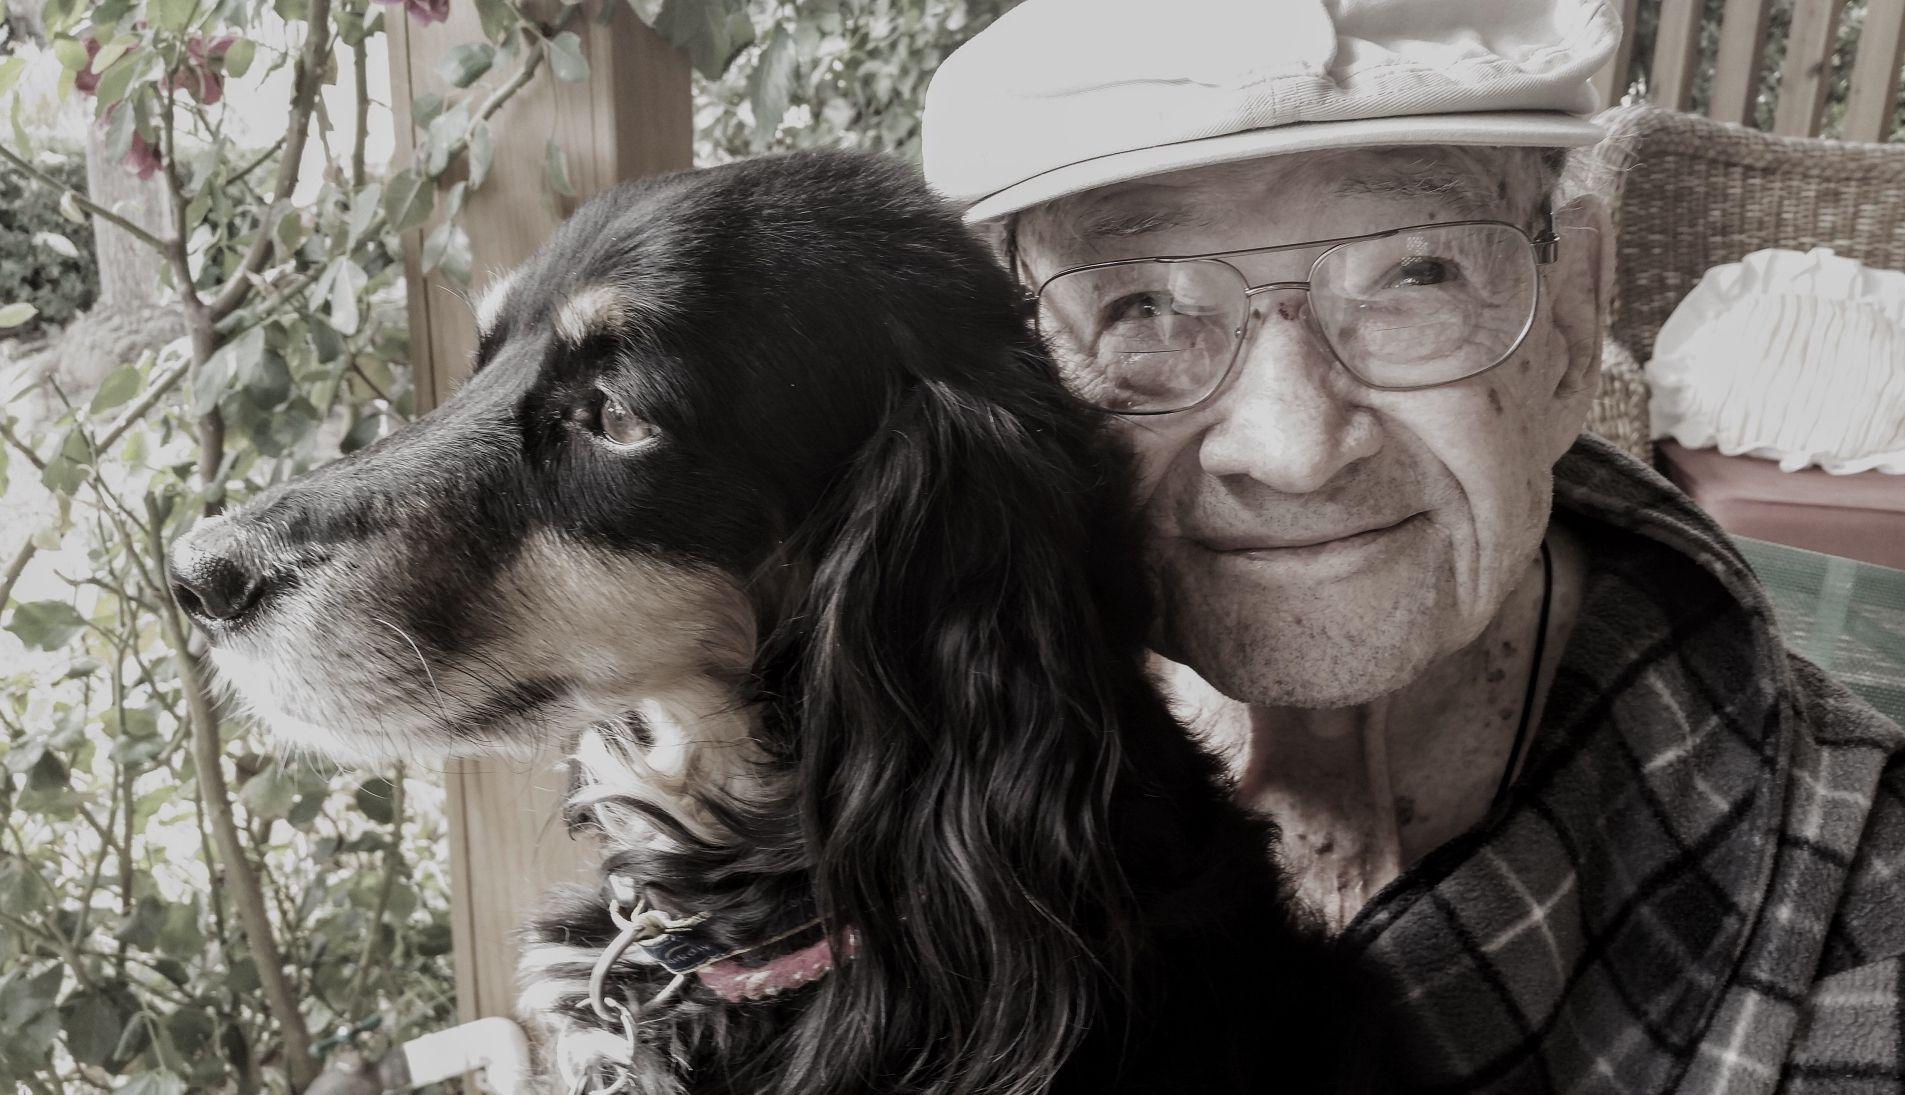 free-dog-walking-service-eldery-vulnerable-bournemouth-cinnamon-trust